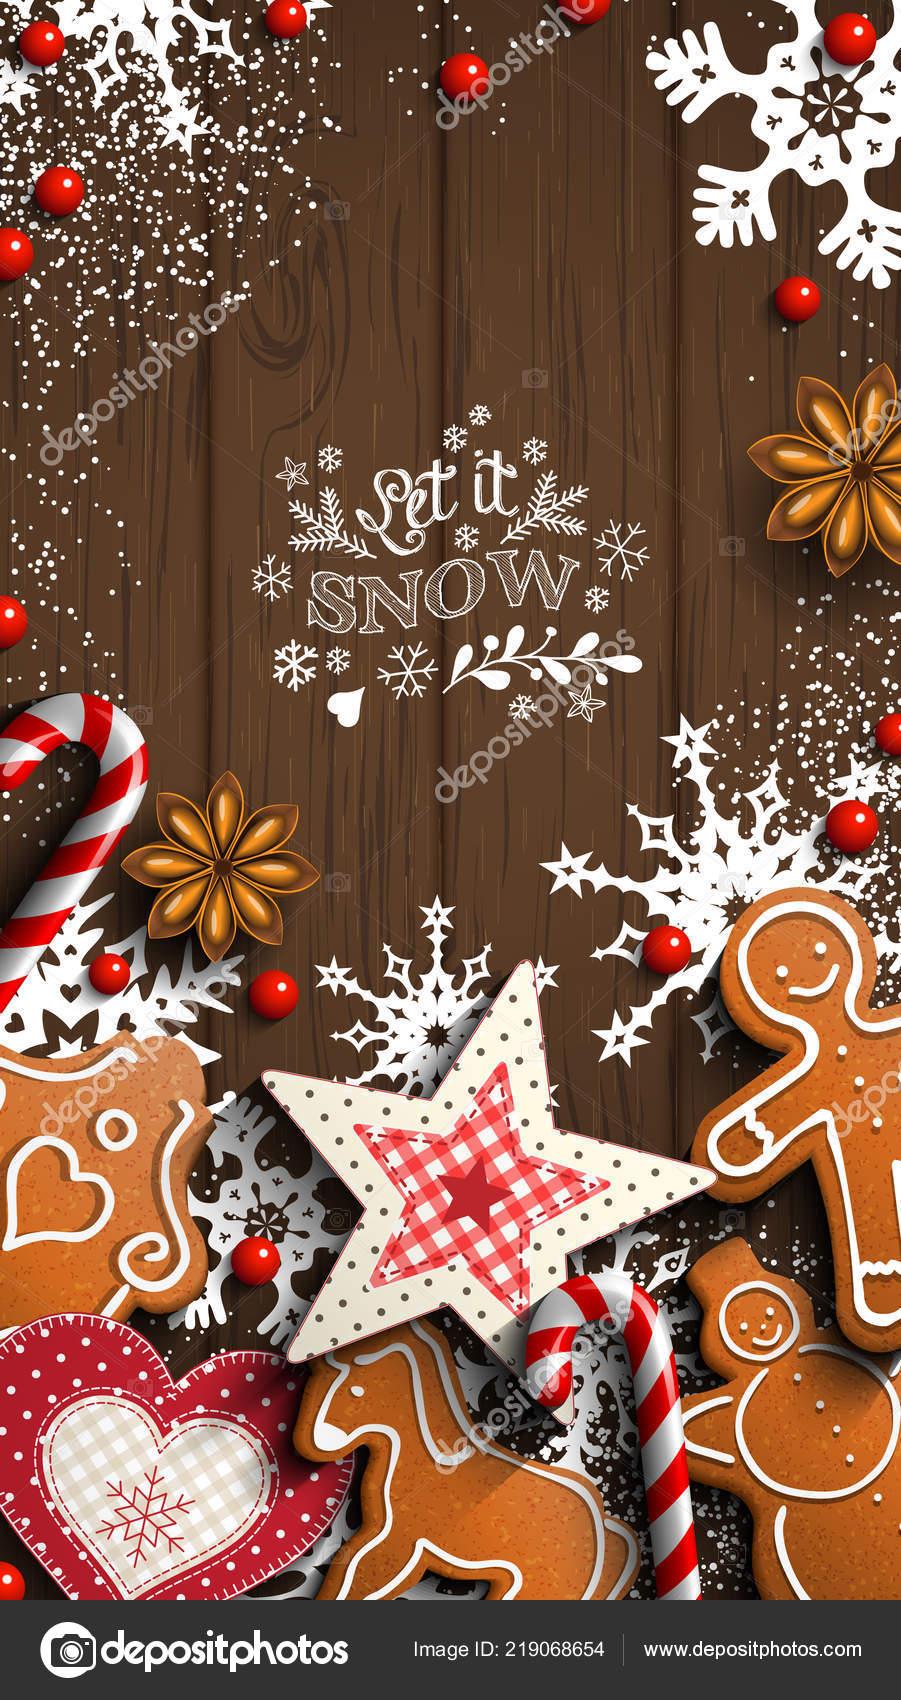 Christmas Wallpaper For Mobile Mobile Phone Christmas Wallpaper